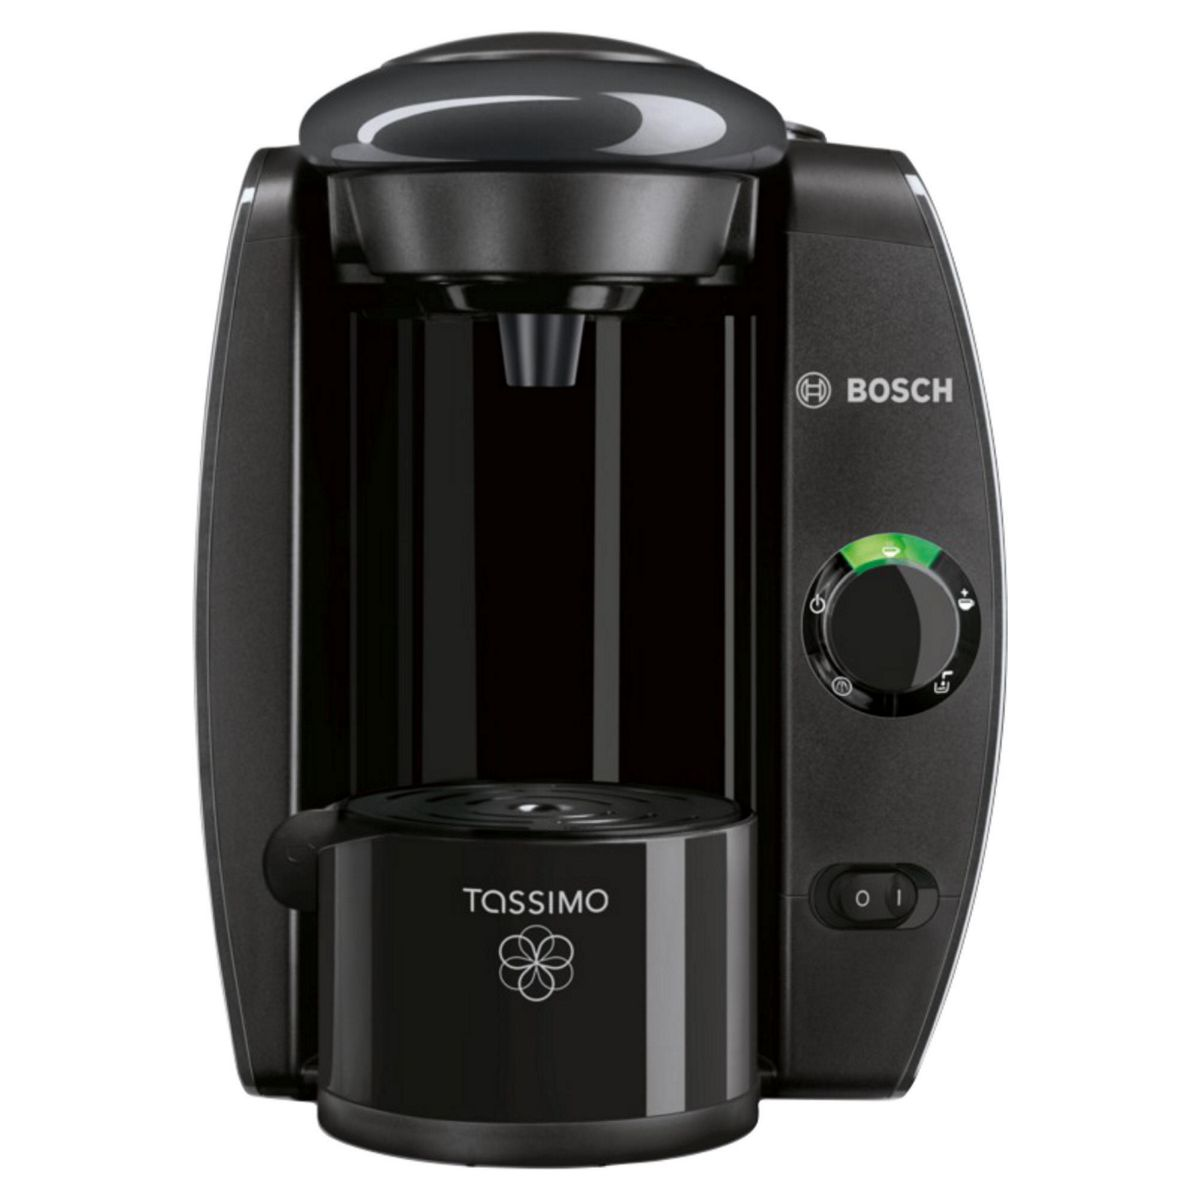 Bosch Tassimo Fidelia TAS4000GB Costa Coffee Machine Hot Drinks 2L 1300W eBay